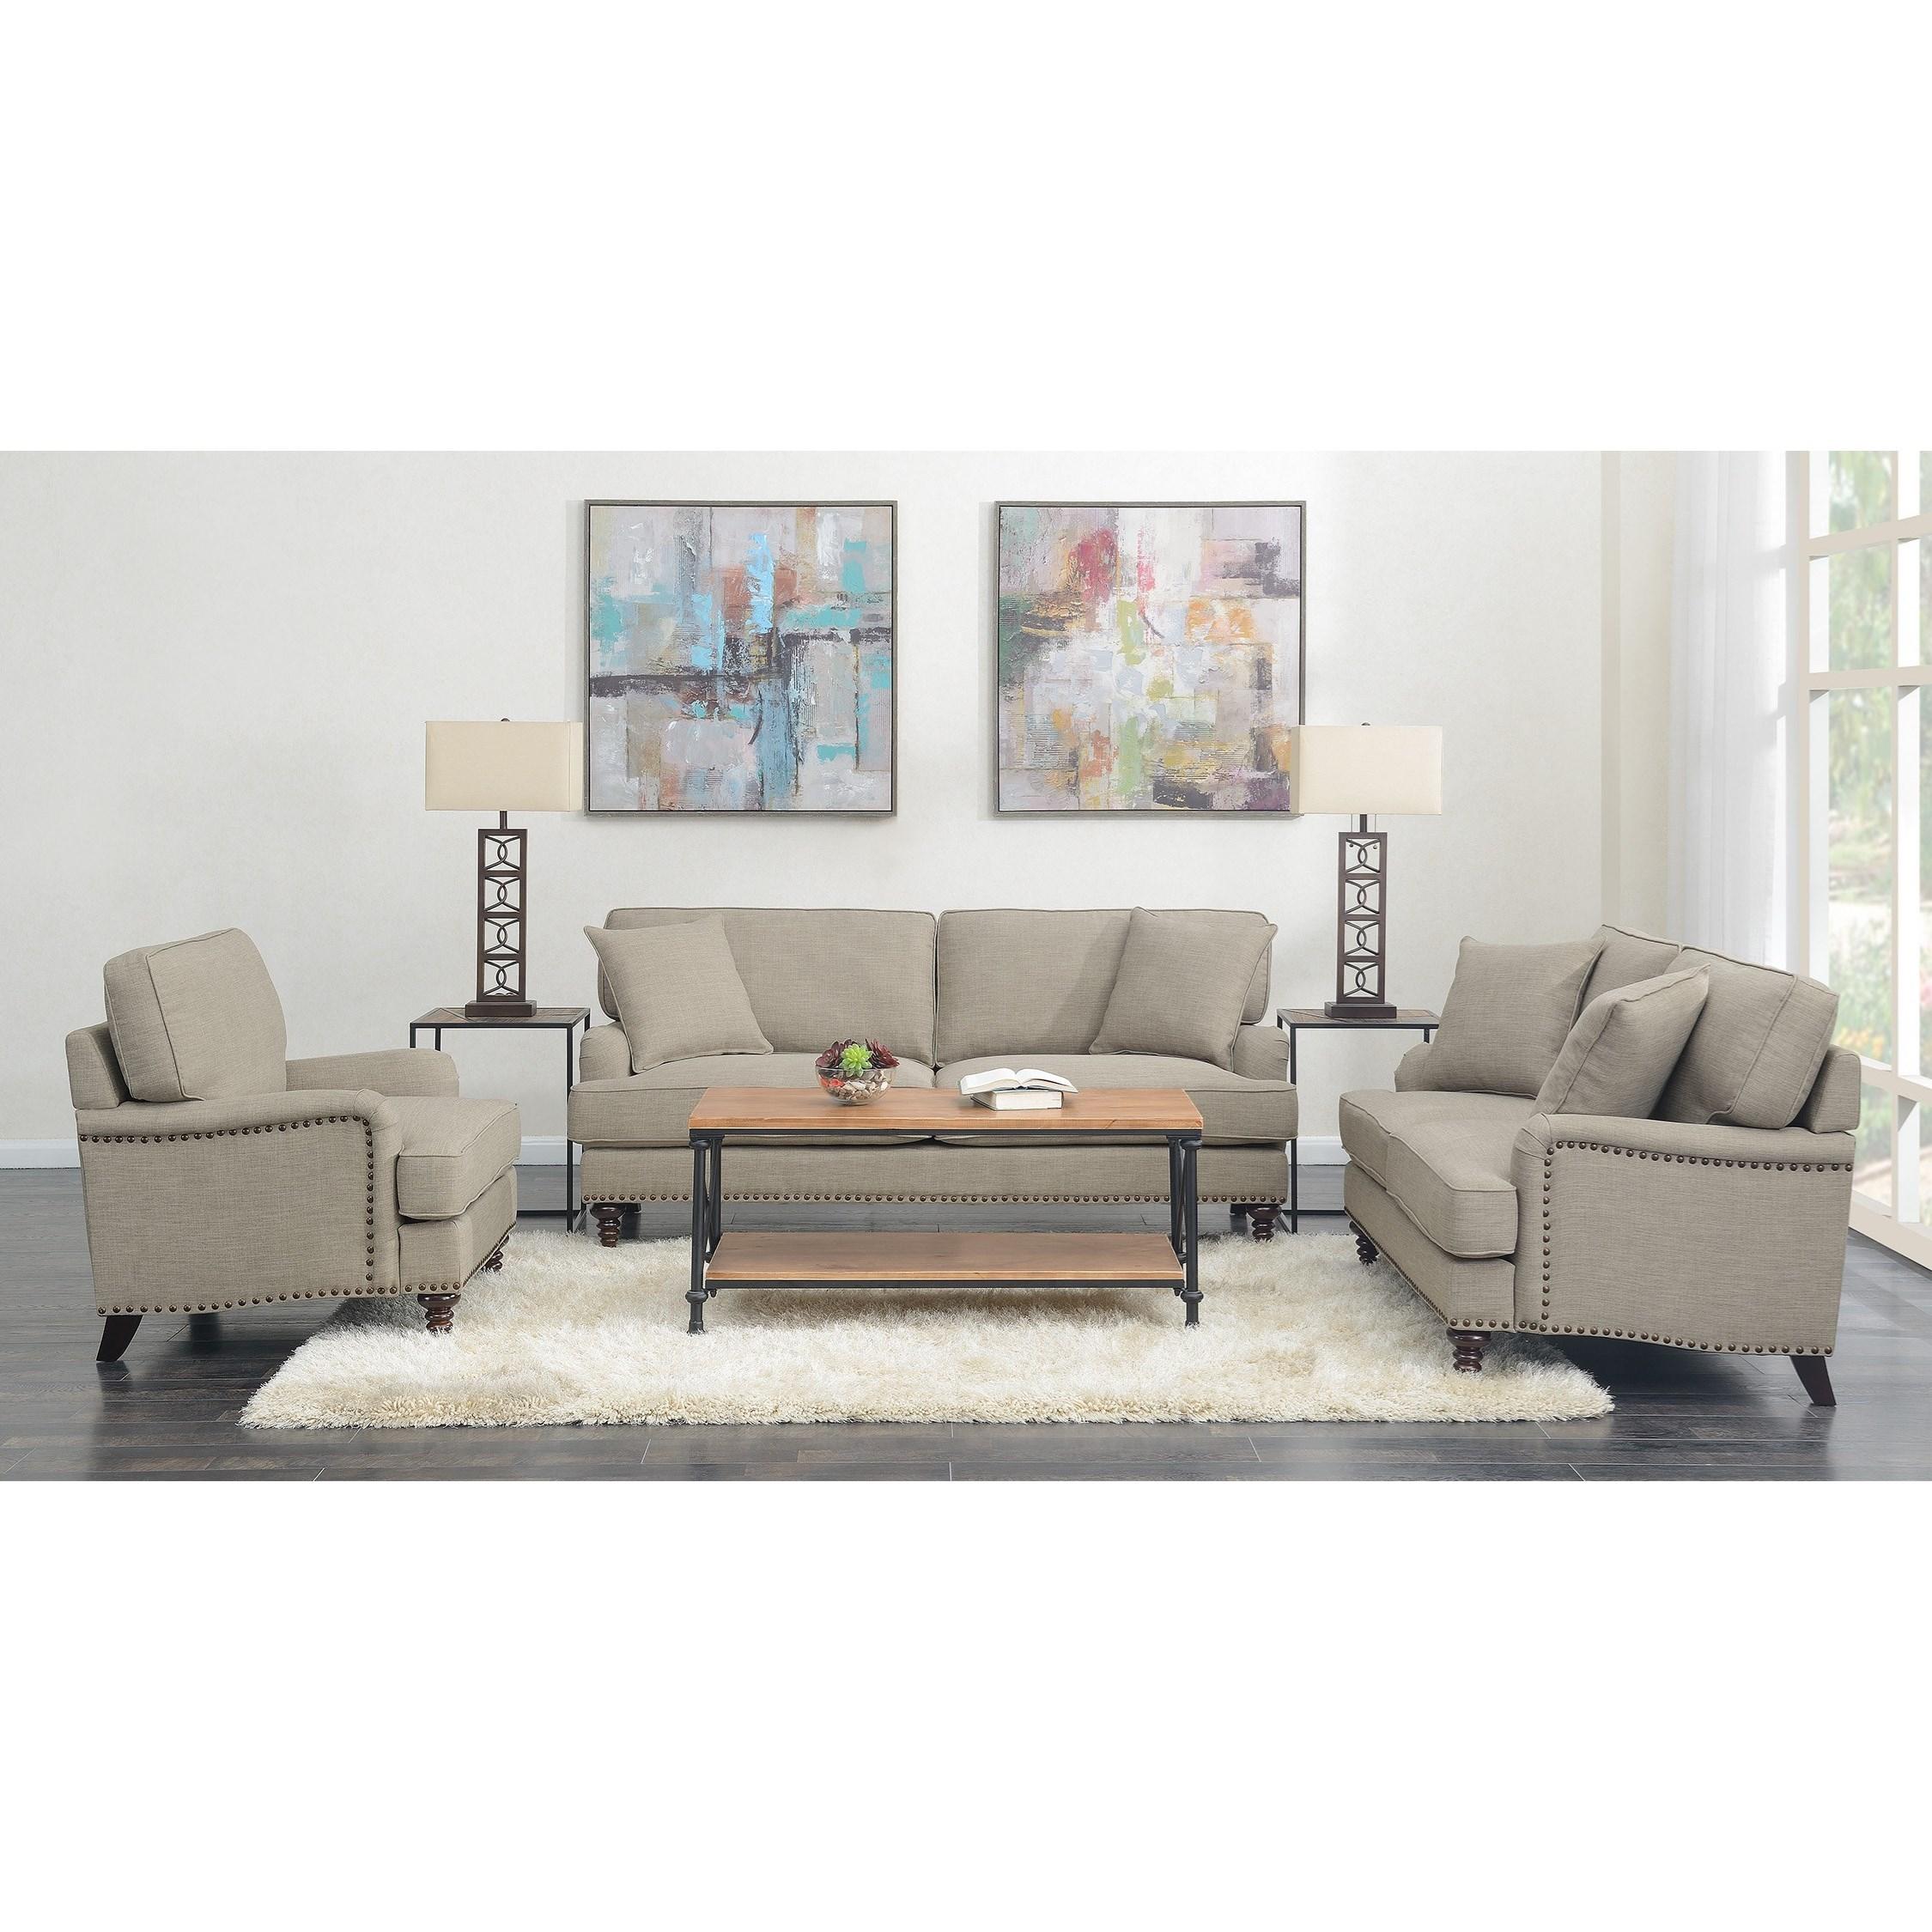 Abby 3PC Set-Sofa, Loveseat & Chair by Elements International at Lynn's Furniture & Mattress